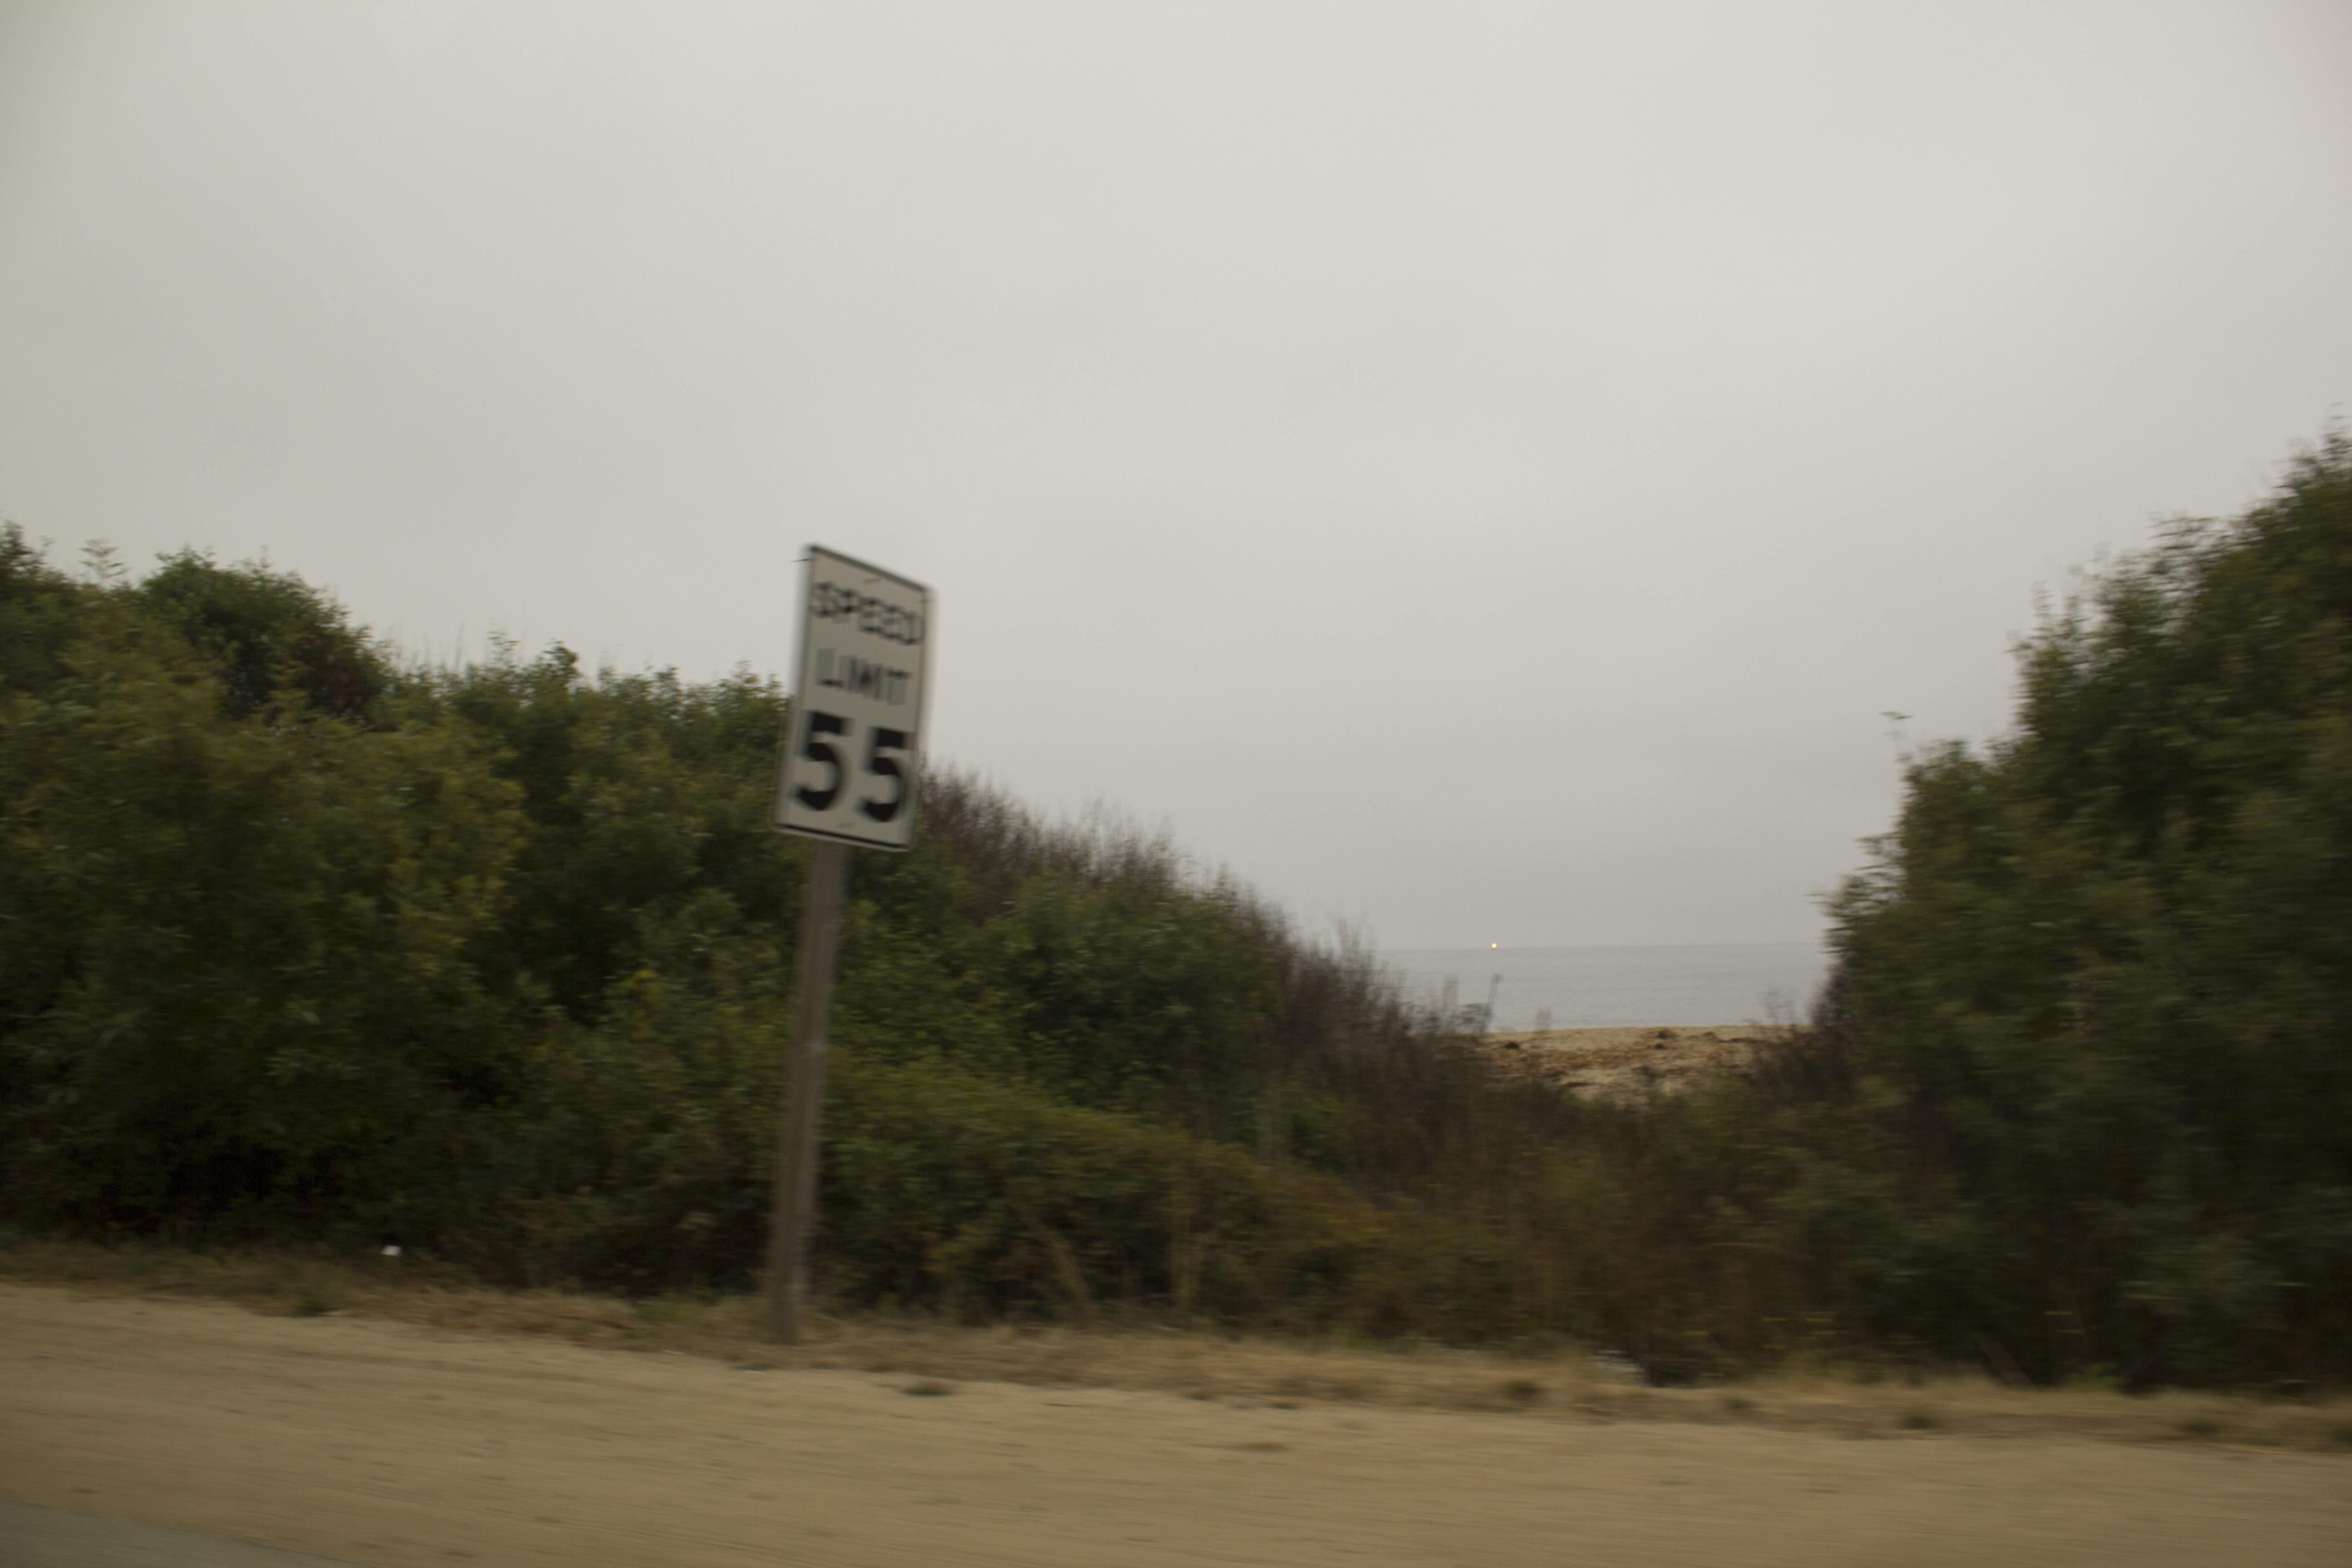 1_road34